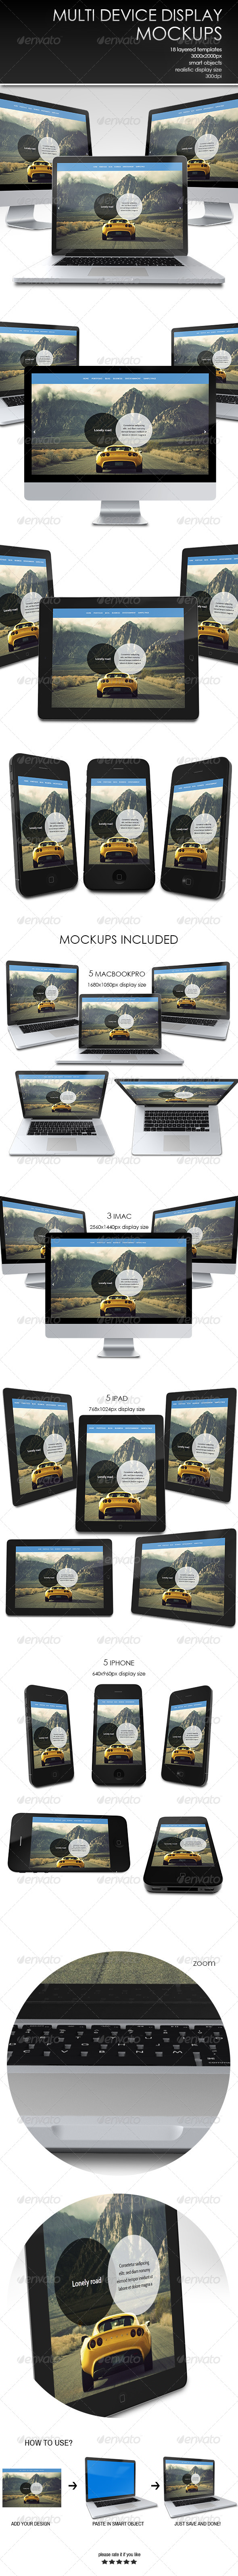 GraphicRiver Multi Display Mockup 7650599